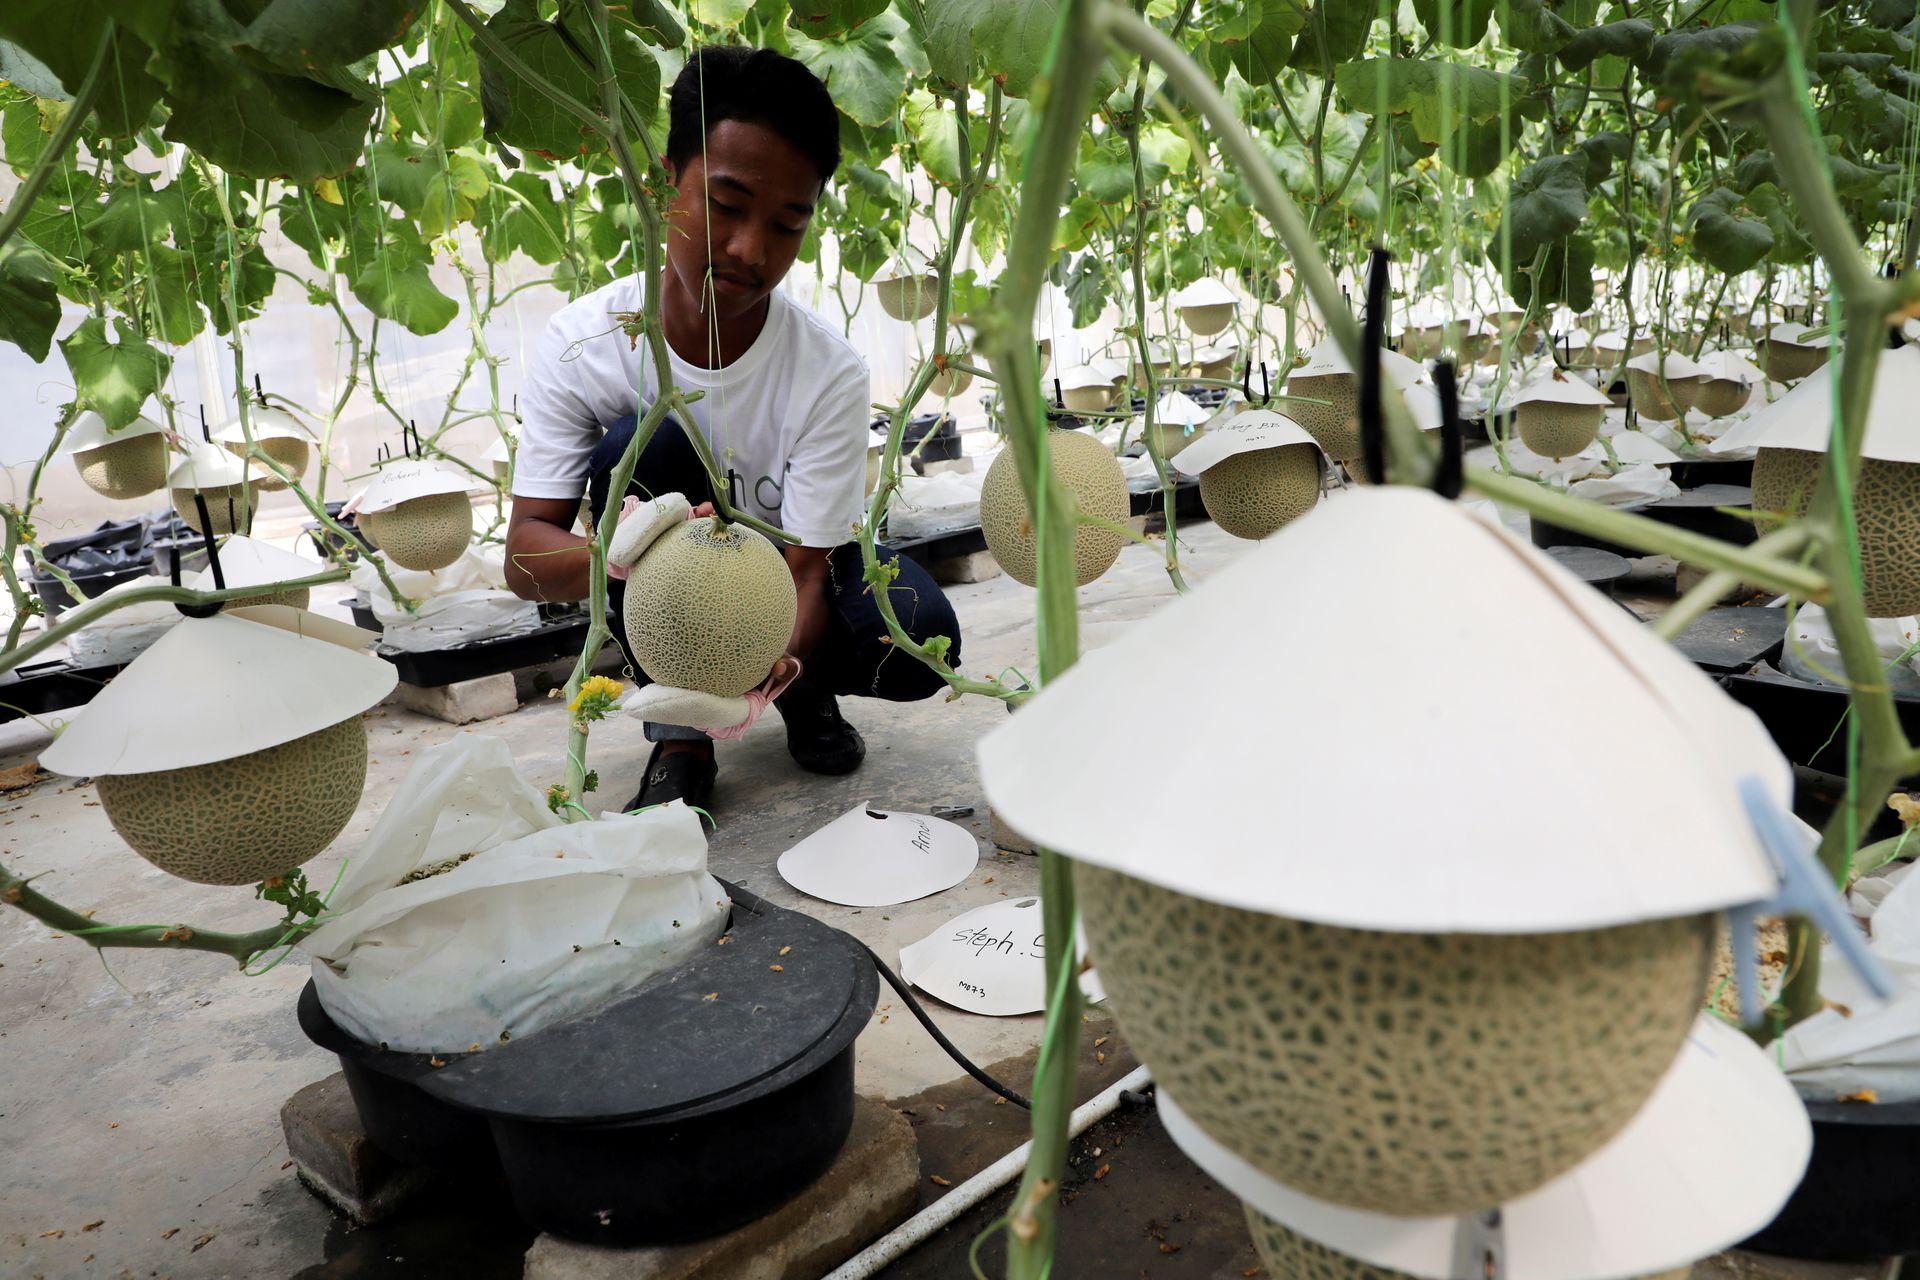 A farmer polishes a Japanese muskmelon with facial pads at Mono Farm in Putrajaya, Malaysia April 8, 2021. Photo: Reuters